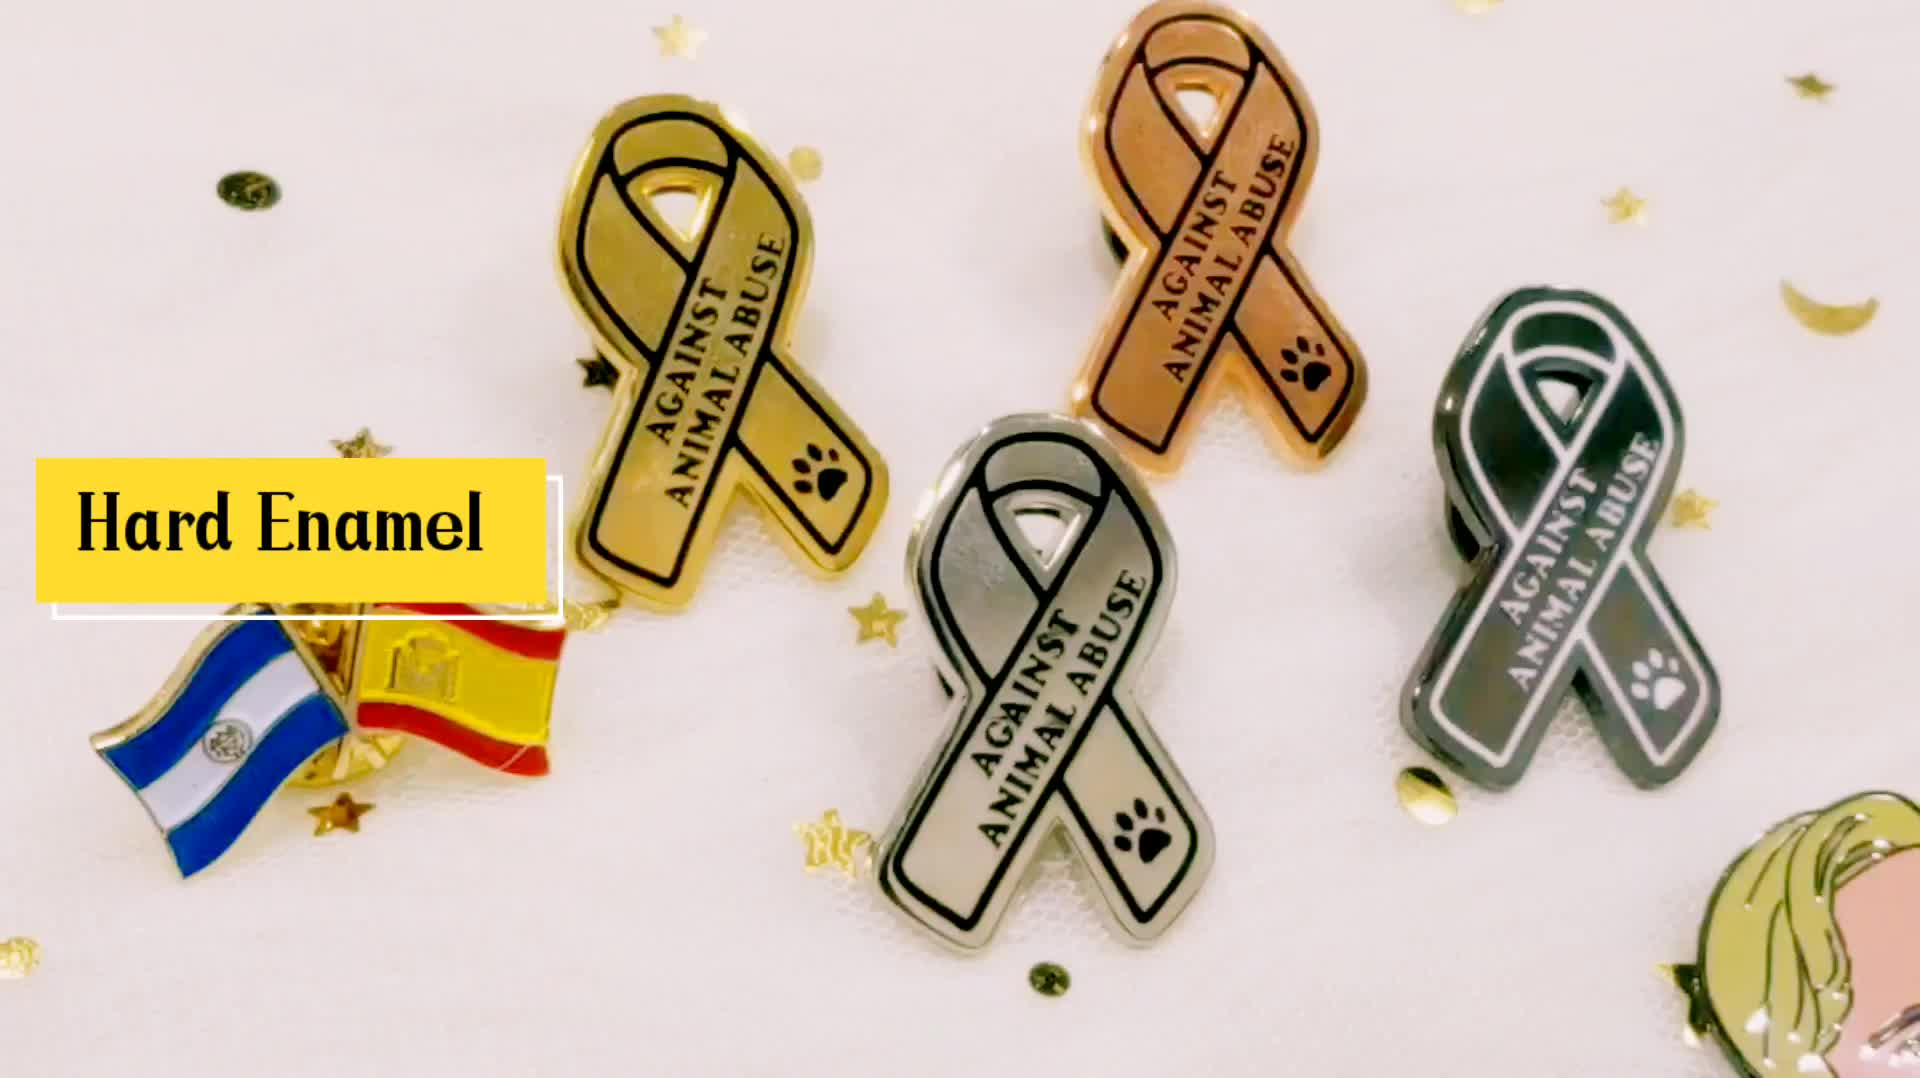 Wholesale New Design High Quality Custom Hard Enamel Pin Badge